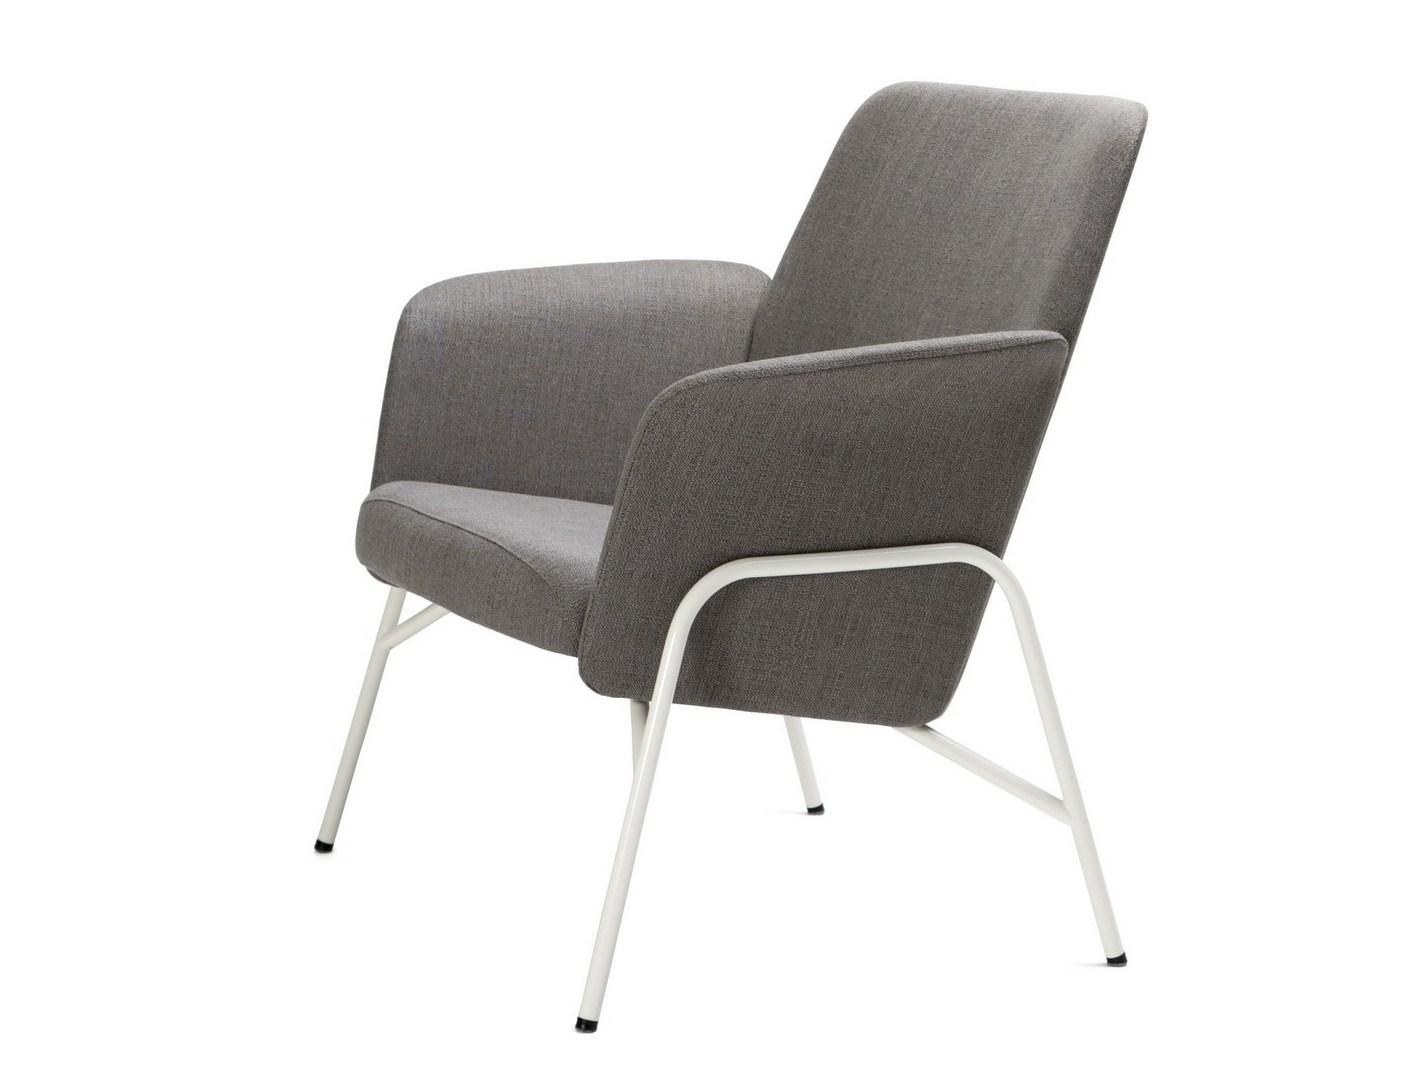 Taivu Lounge Chair by Mikko Laakkonen for Inno Interior Oy